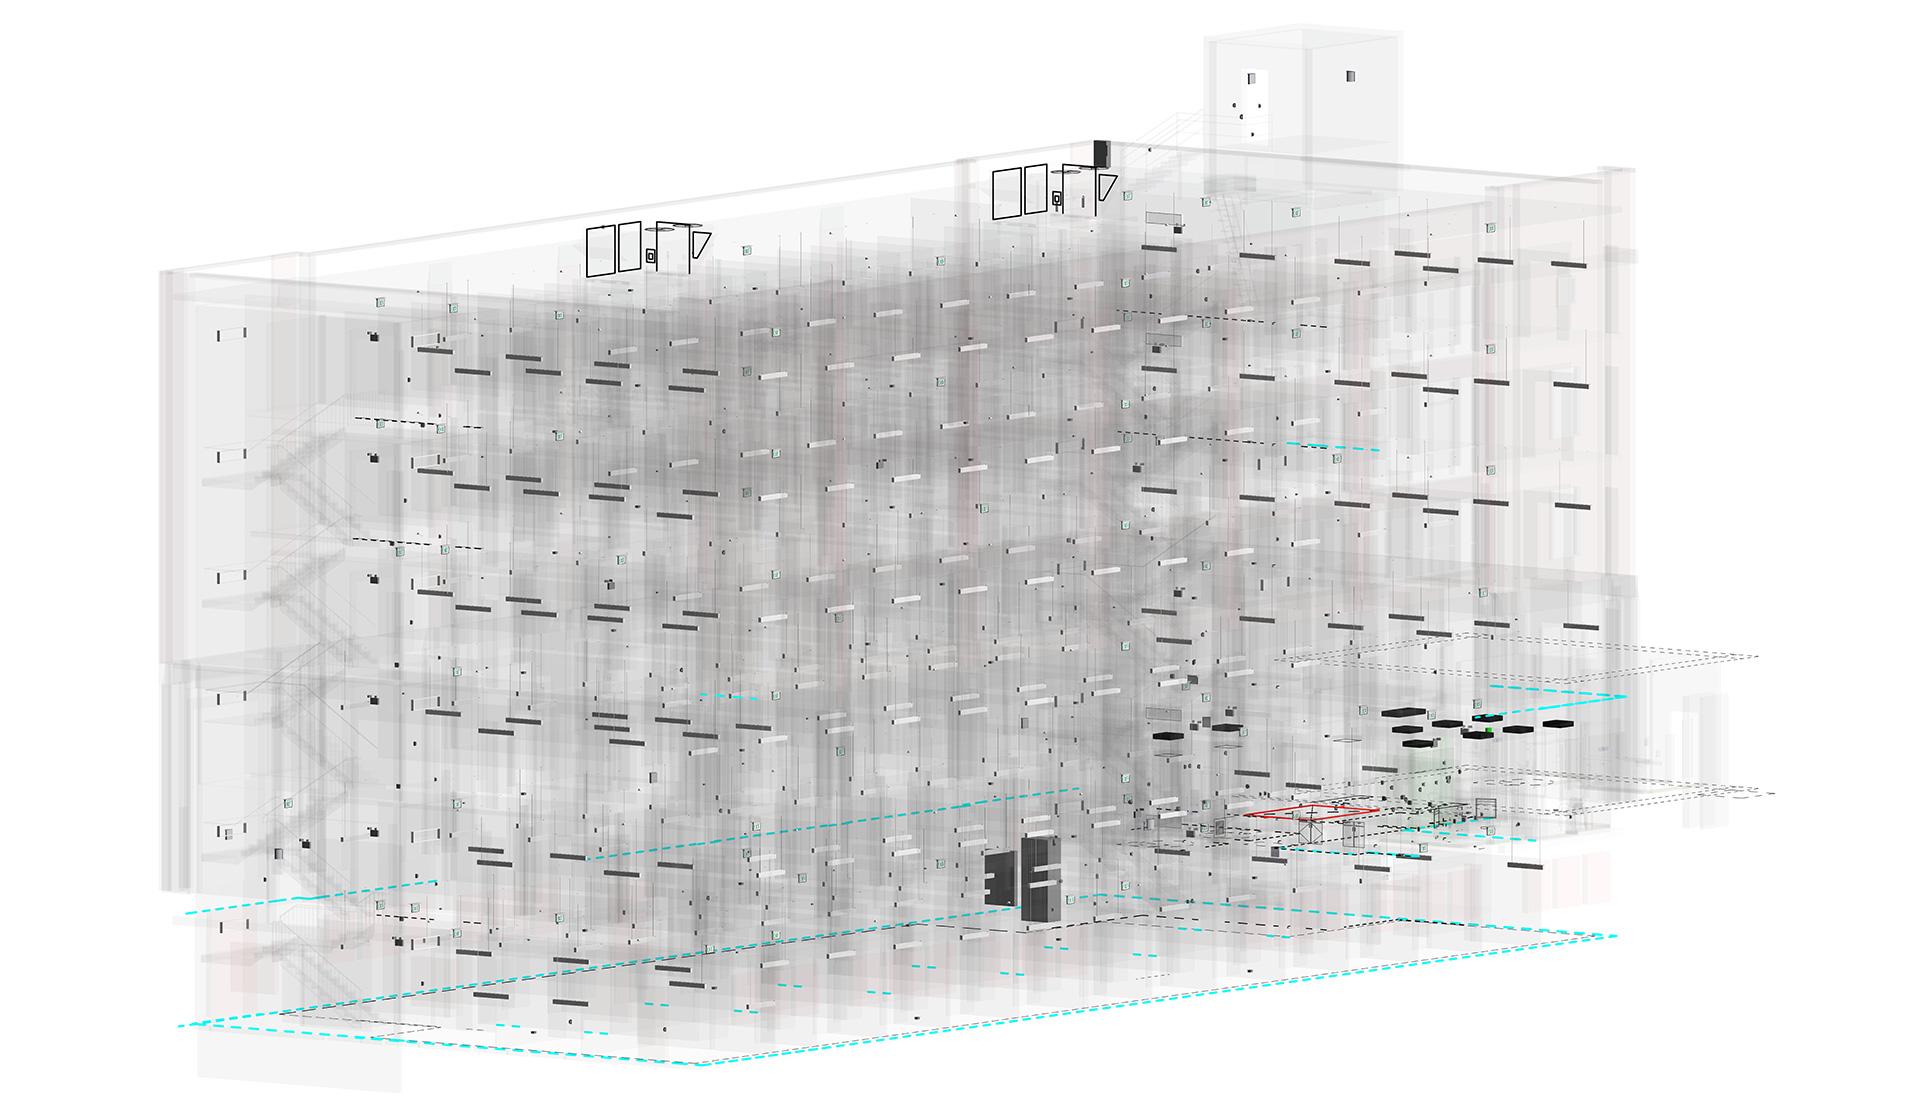 3D-Electrical-BIM-Model-Commercial-Revit-Modeling-by-United-BIM